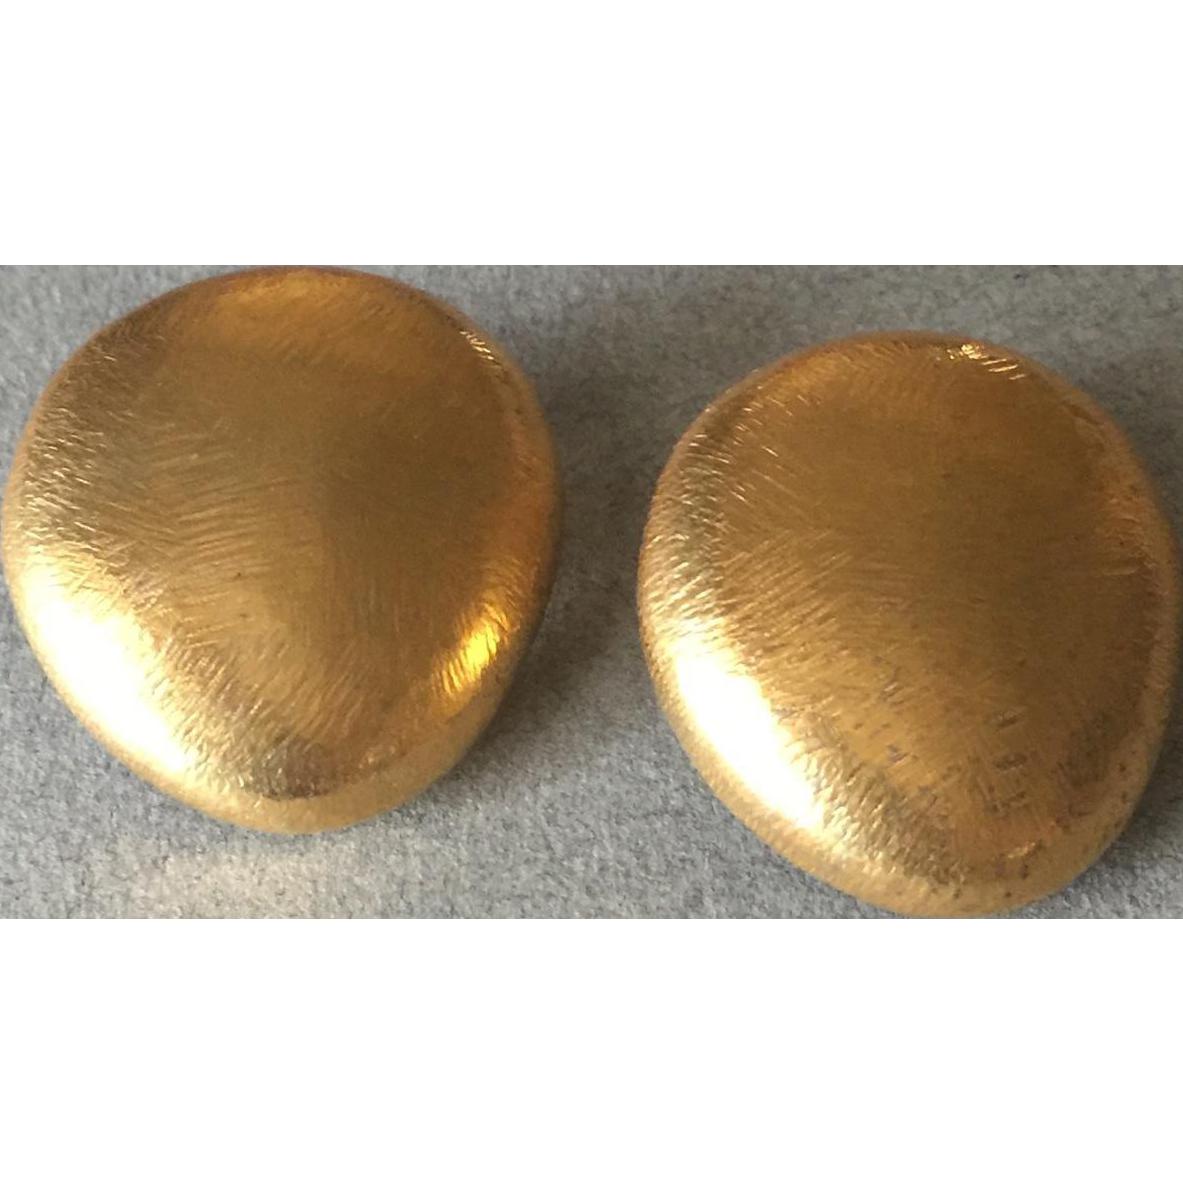 John Iversen 18KT Gold Vermeil & Sterling Silver Pebble Earrings